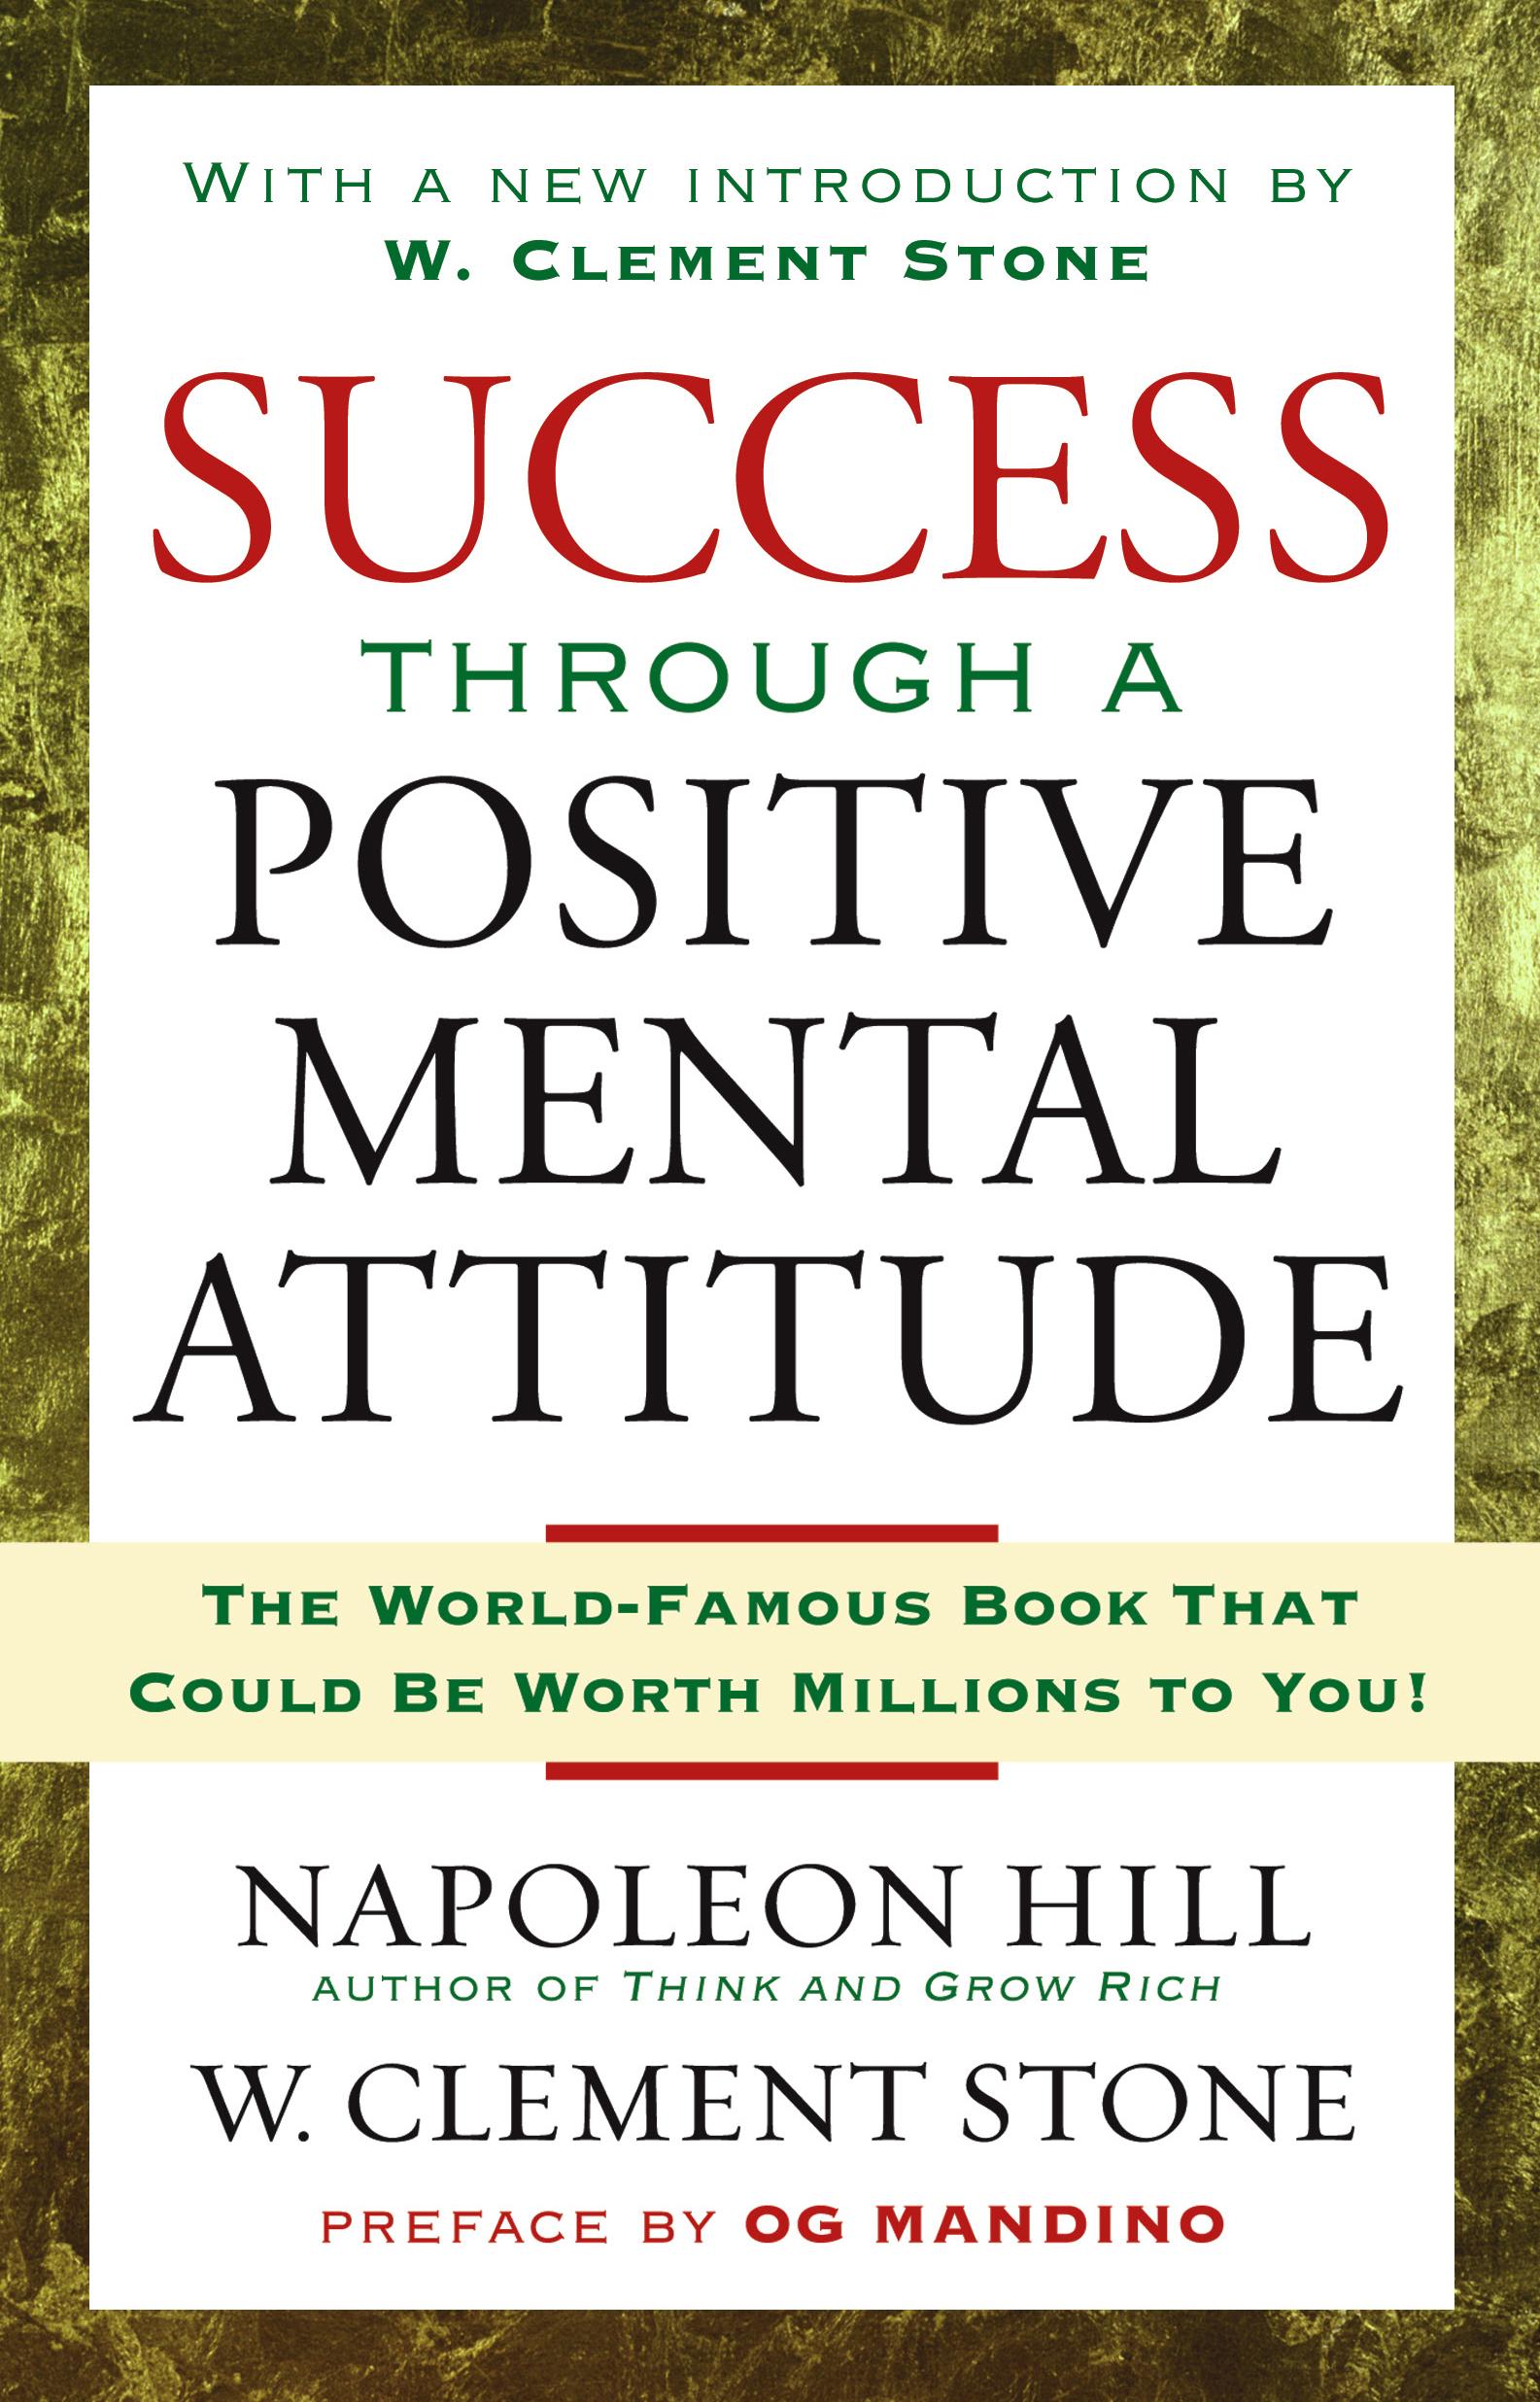 success through a positive mental attitude book by napoleon hill book cover image jpg success through a positive mental attitude